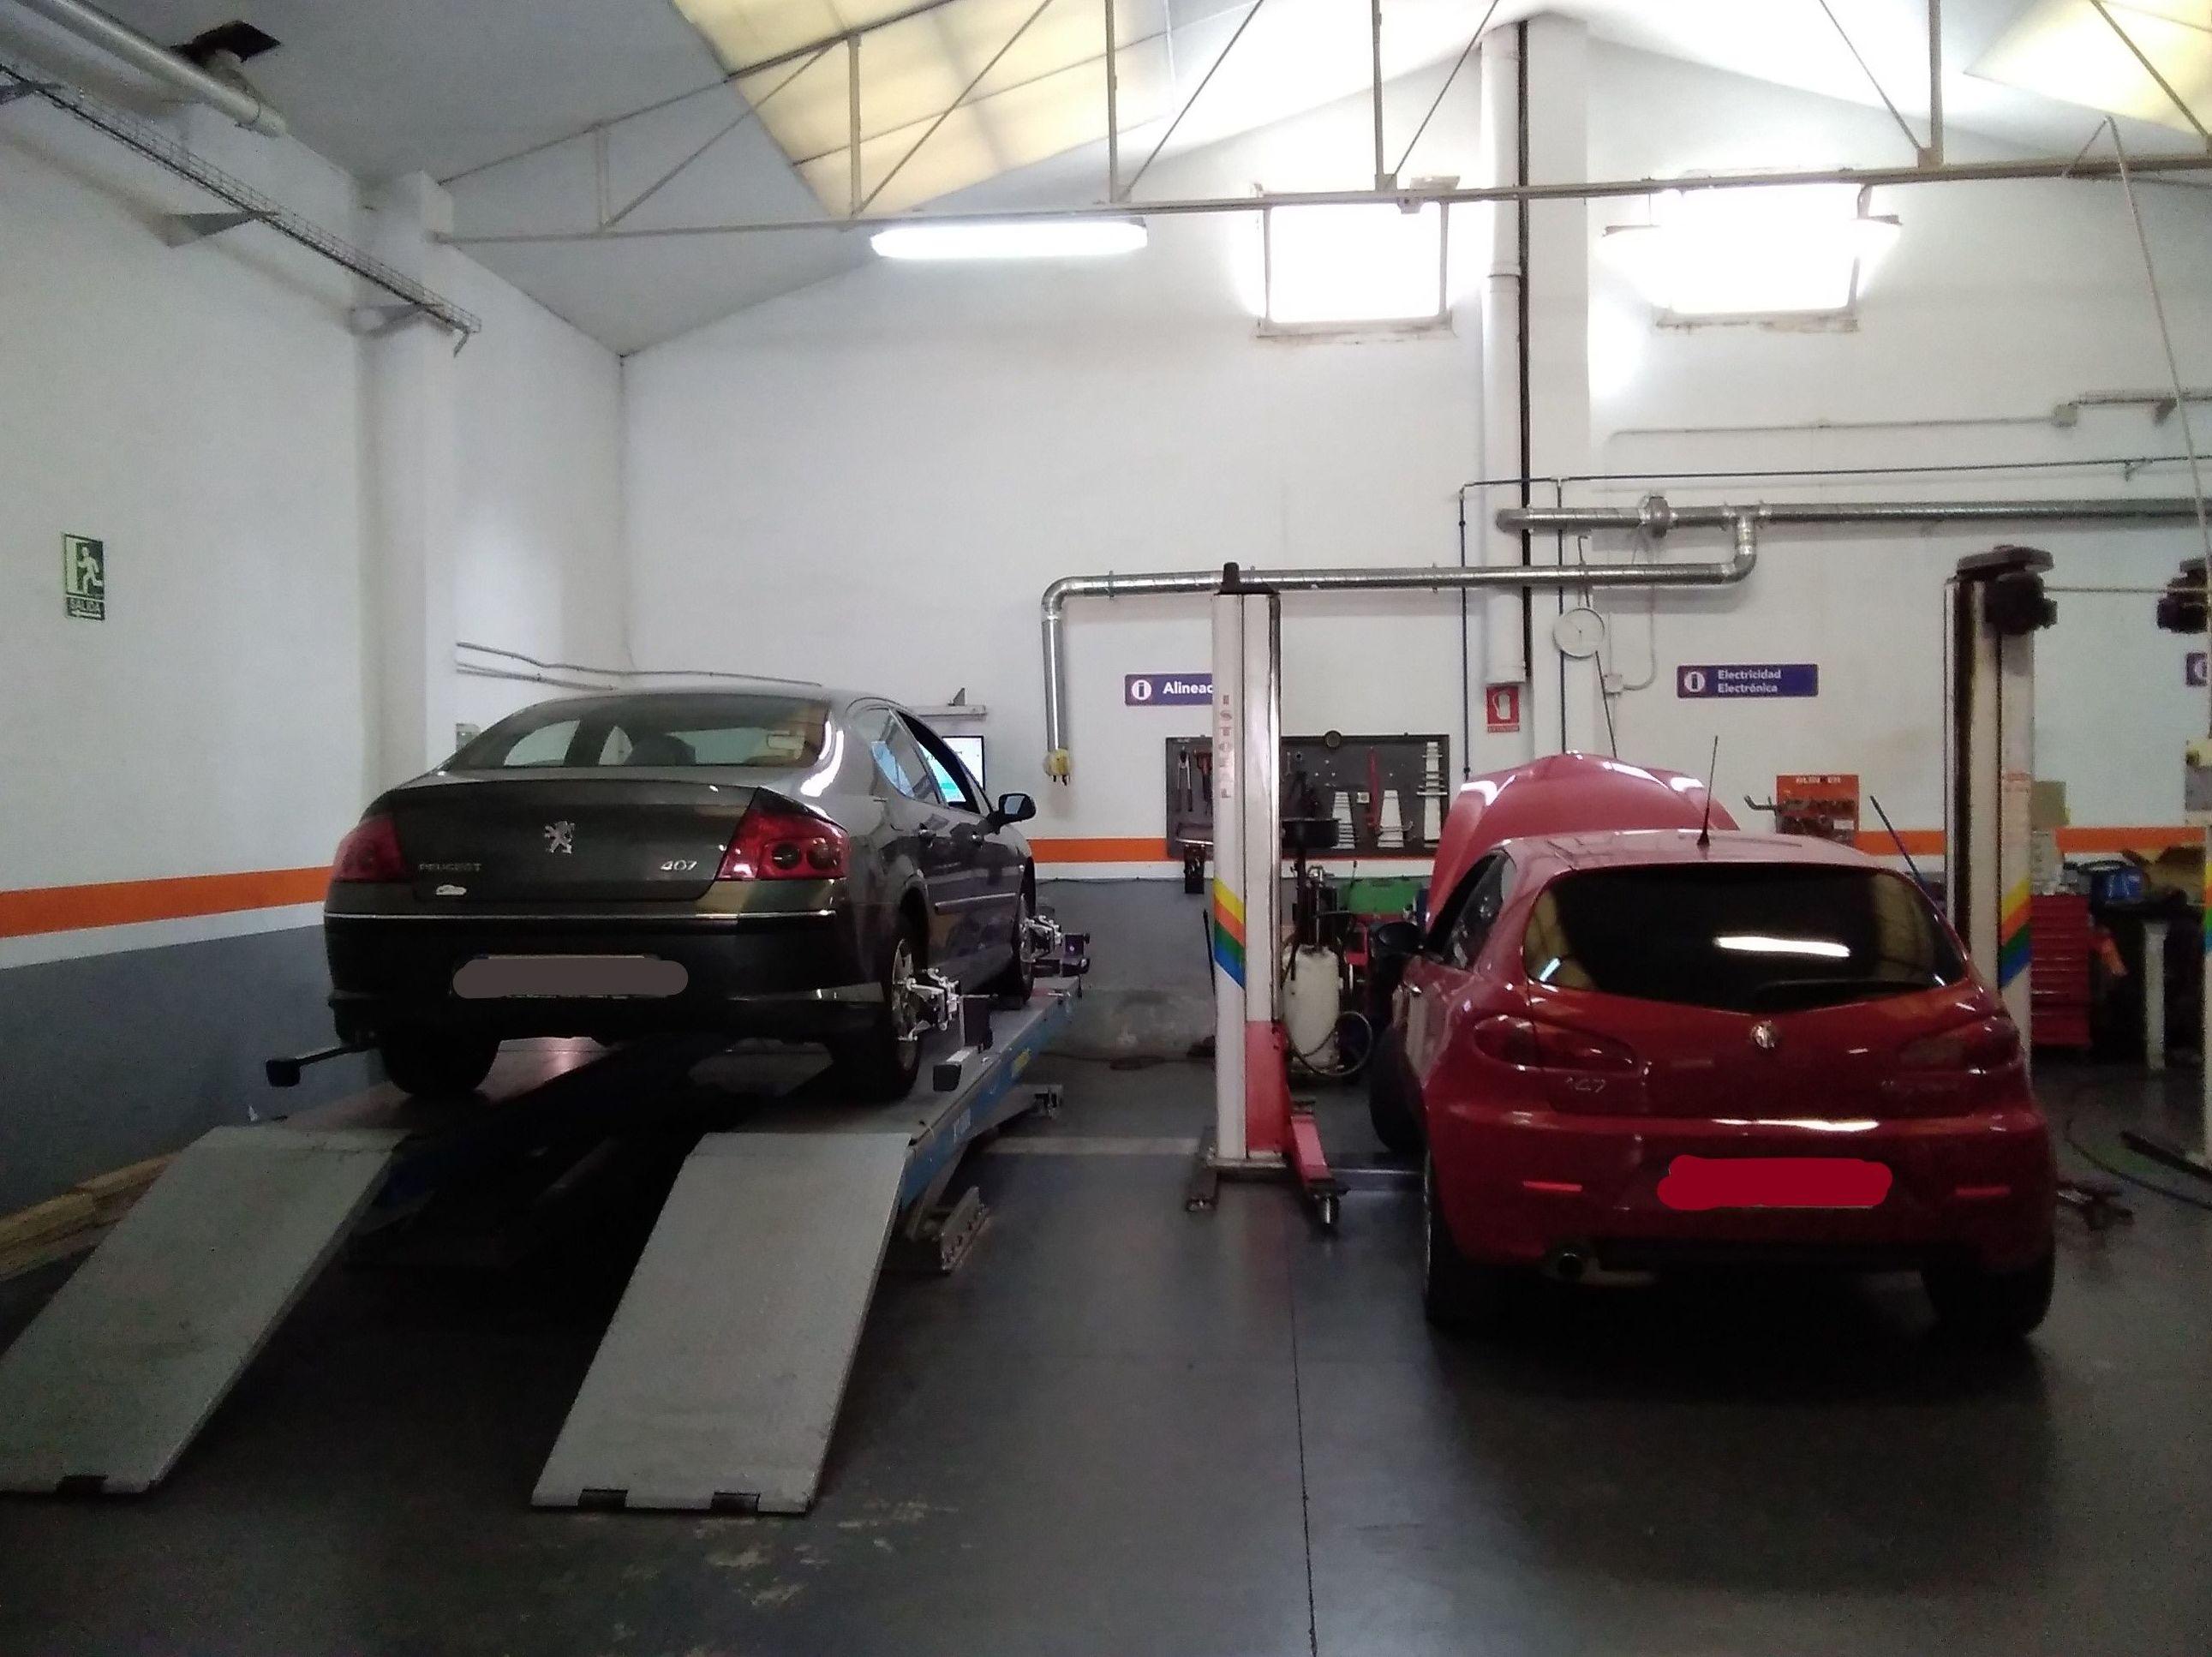 Foto 5 de Taller de automóviles en Zaragoza | Talleres Montecarlo